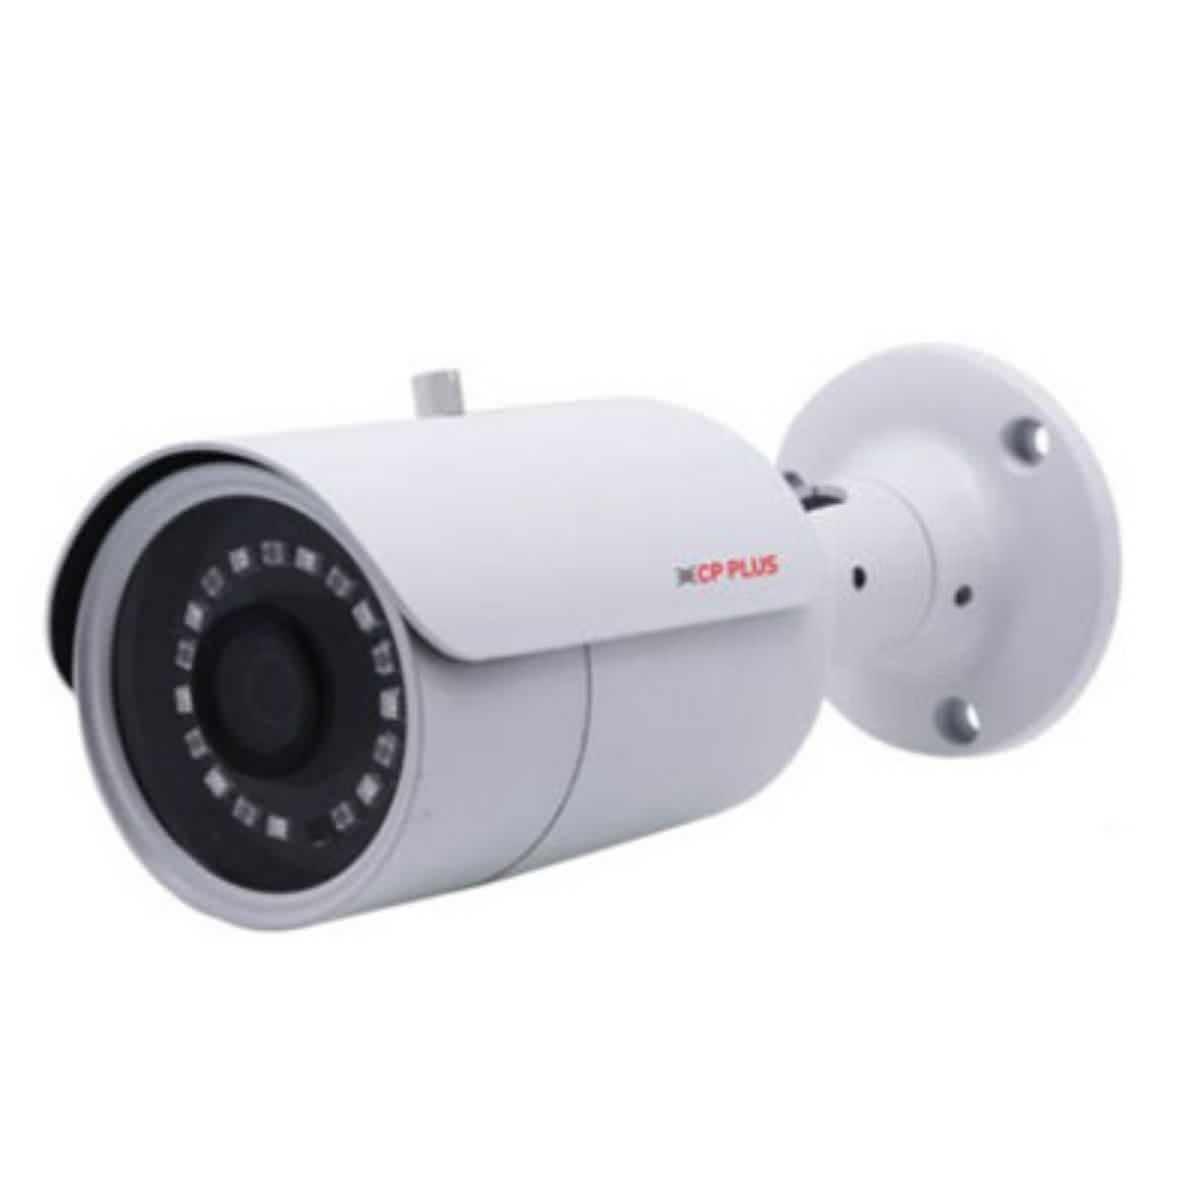 CP Plus CP-VAC-T10L3 1 MP 30M IR Bullet Camera (White)